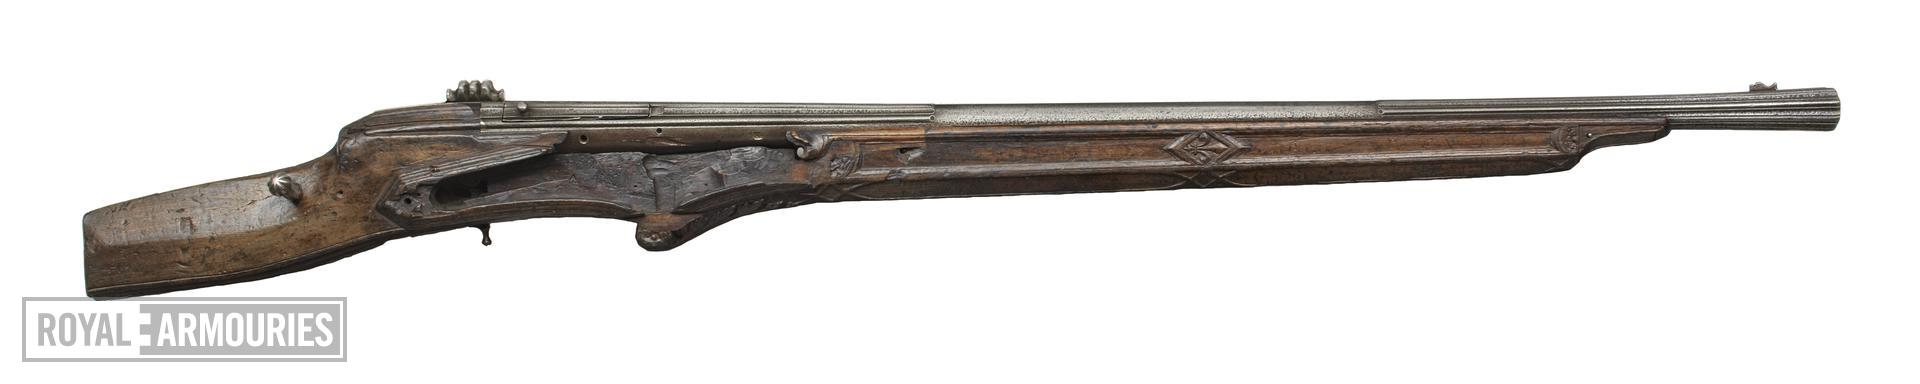 Wheellock breech-loading gun Of Henry VIII